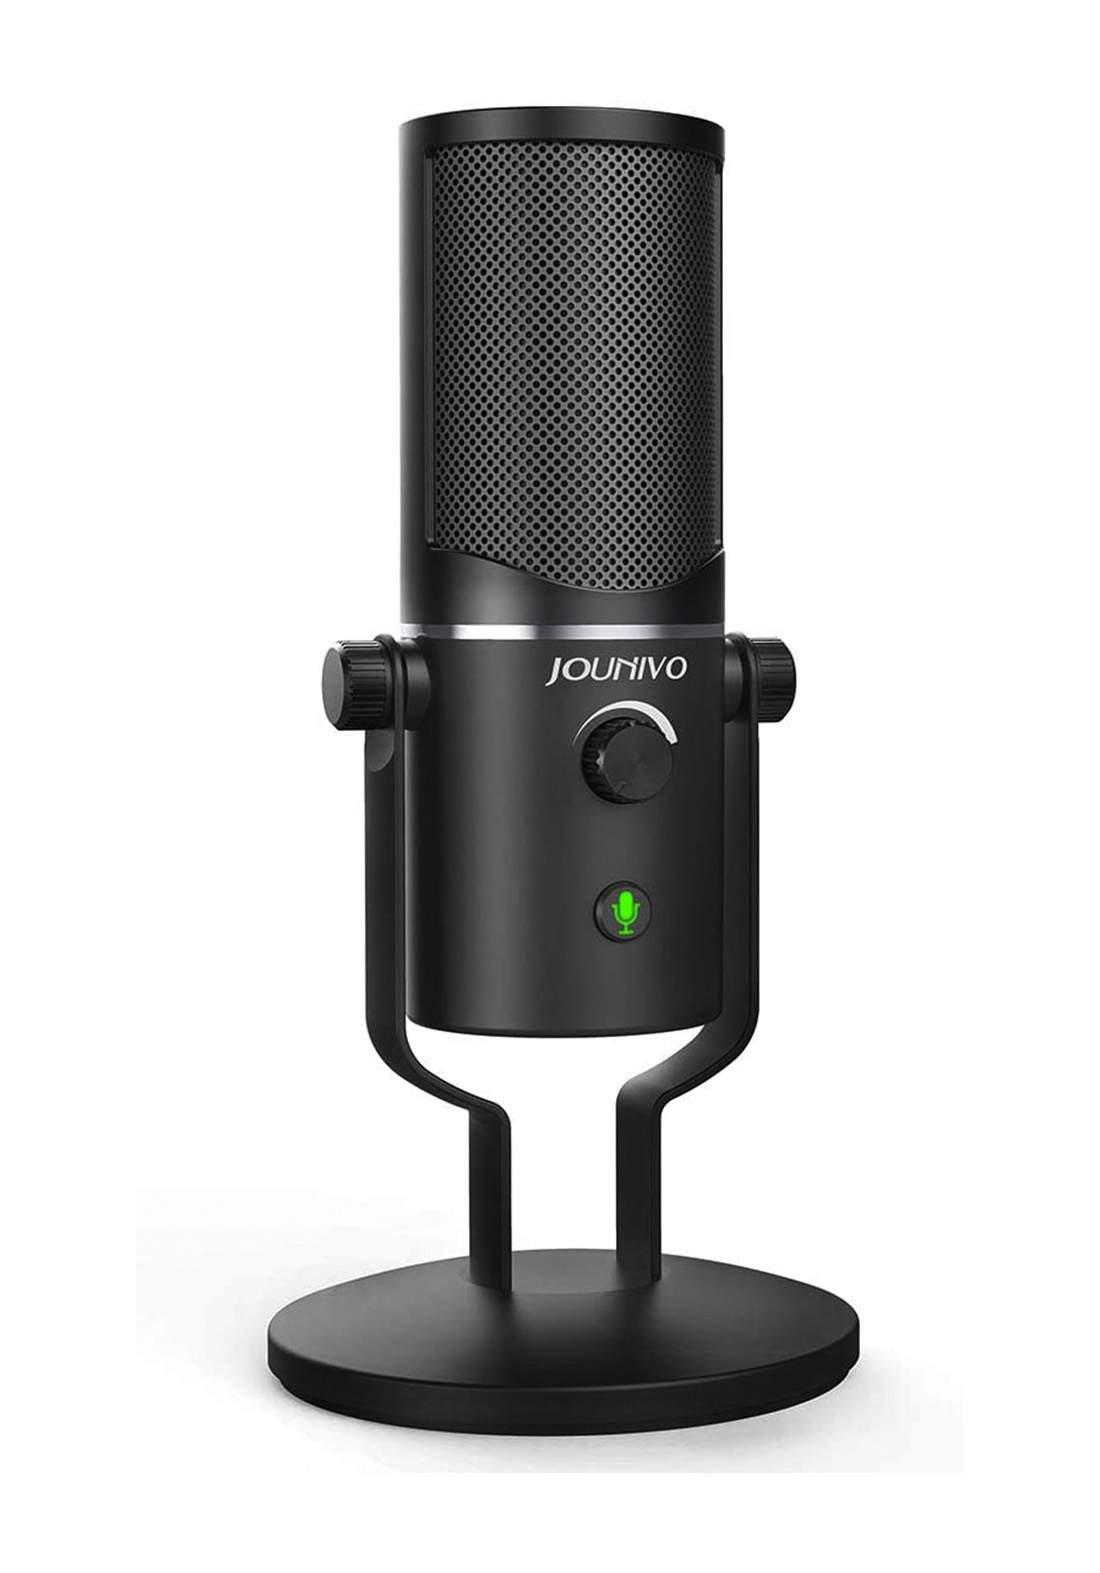 Jounivo USB Microphone JV-902 Computer Cardioid Condenser -Black مايكروفون